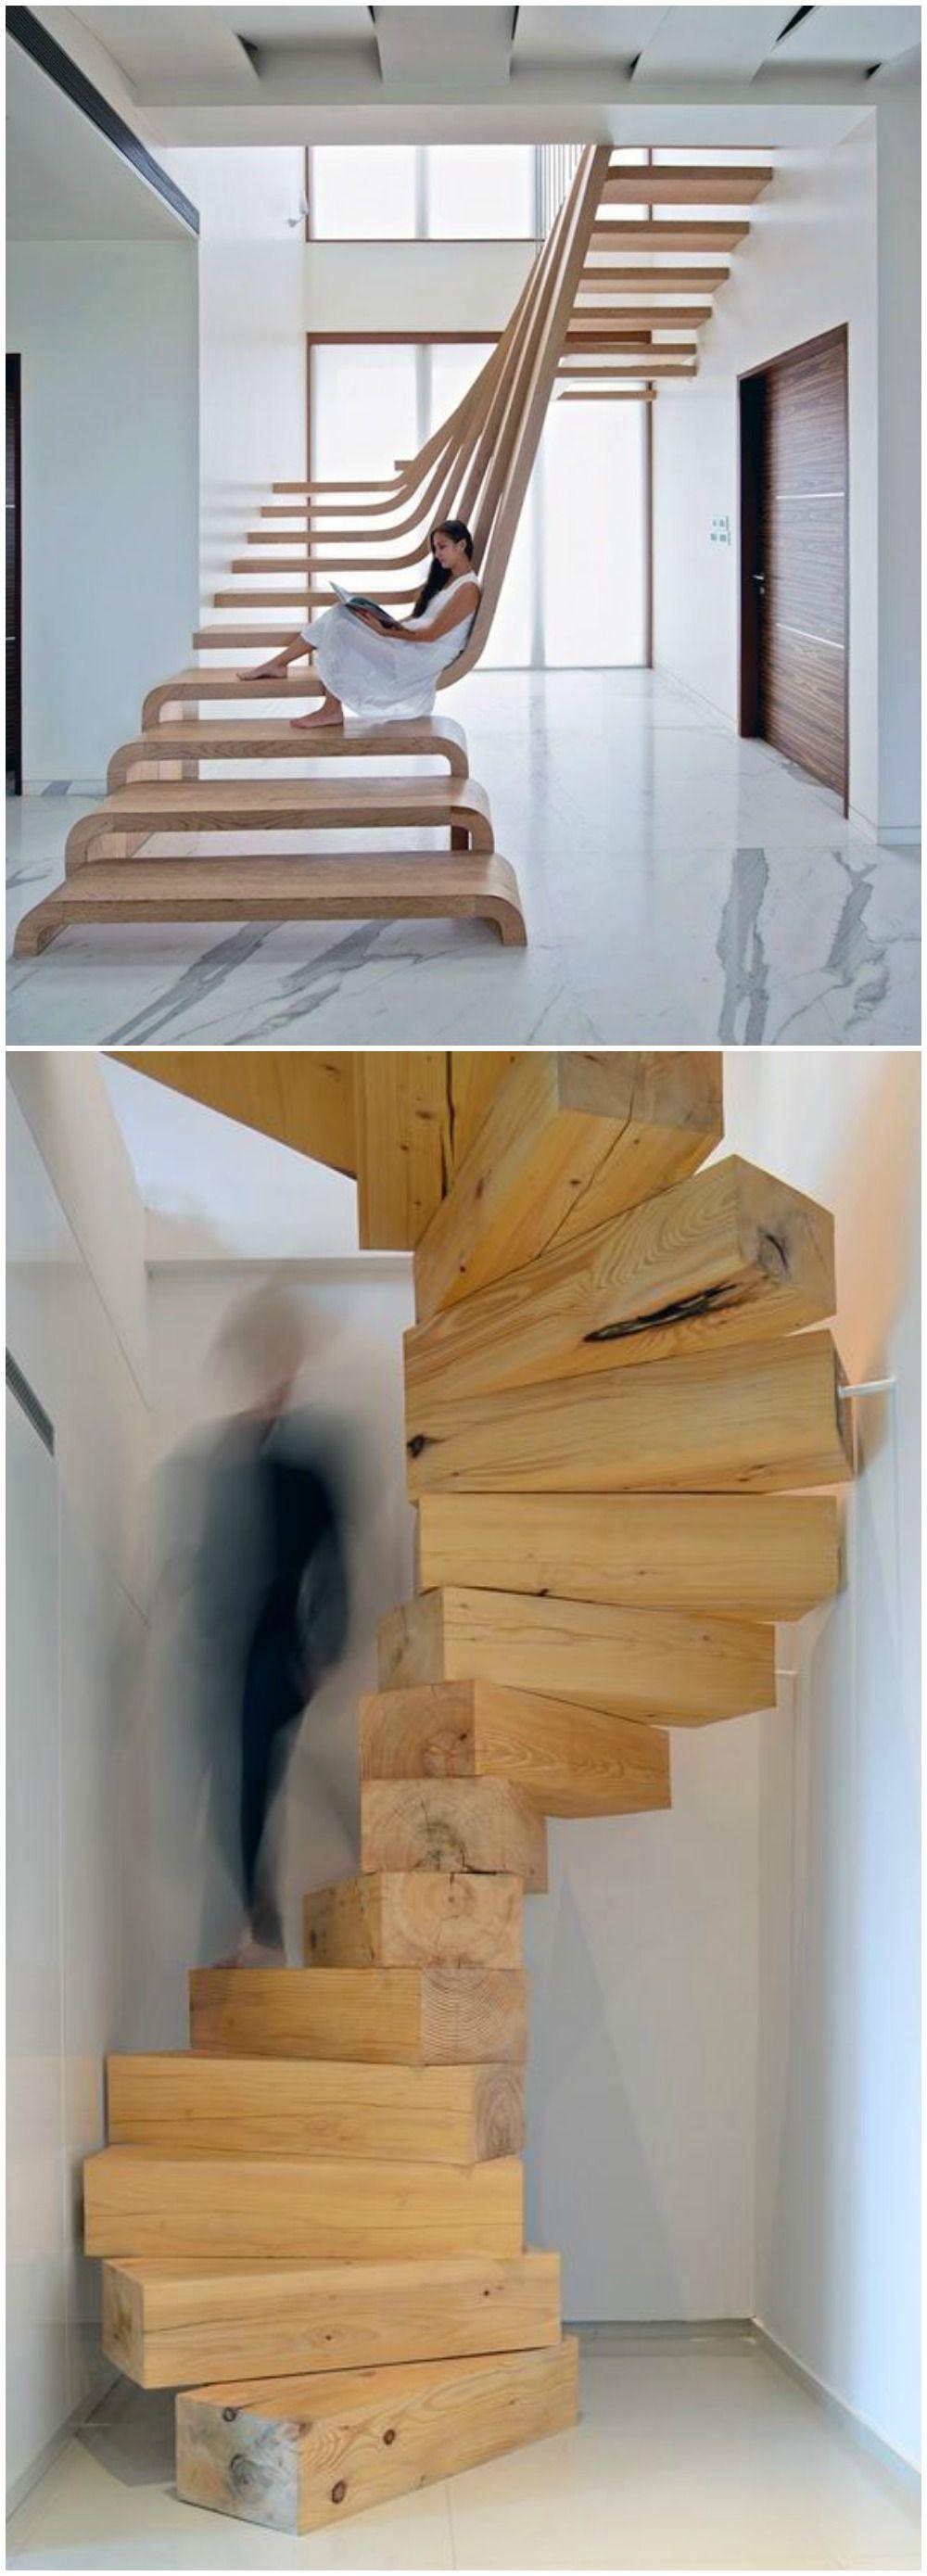 Pin de andres casta eda en arquitectura pinterest for Escaleras arquitectura